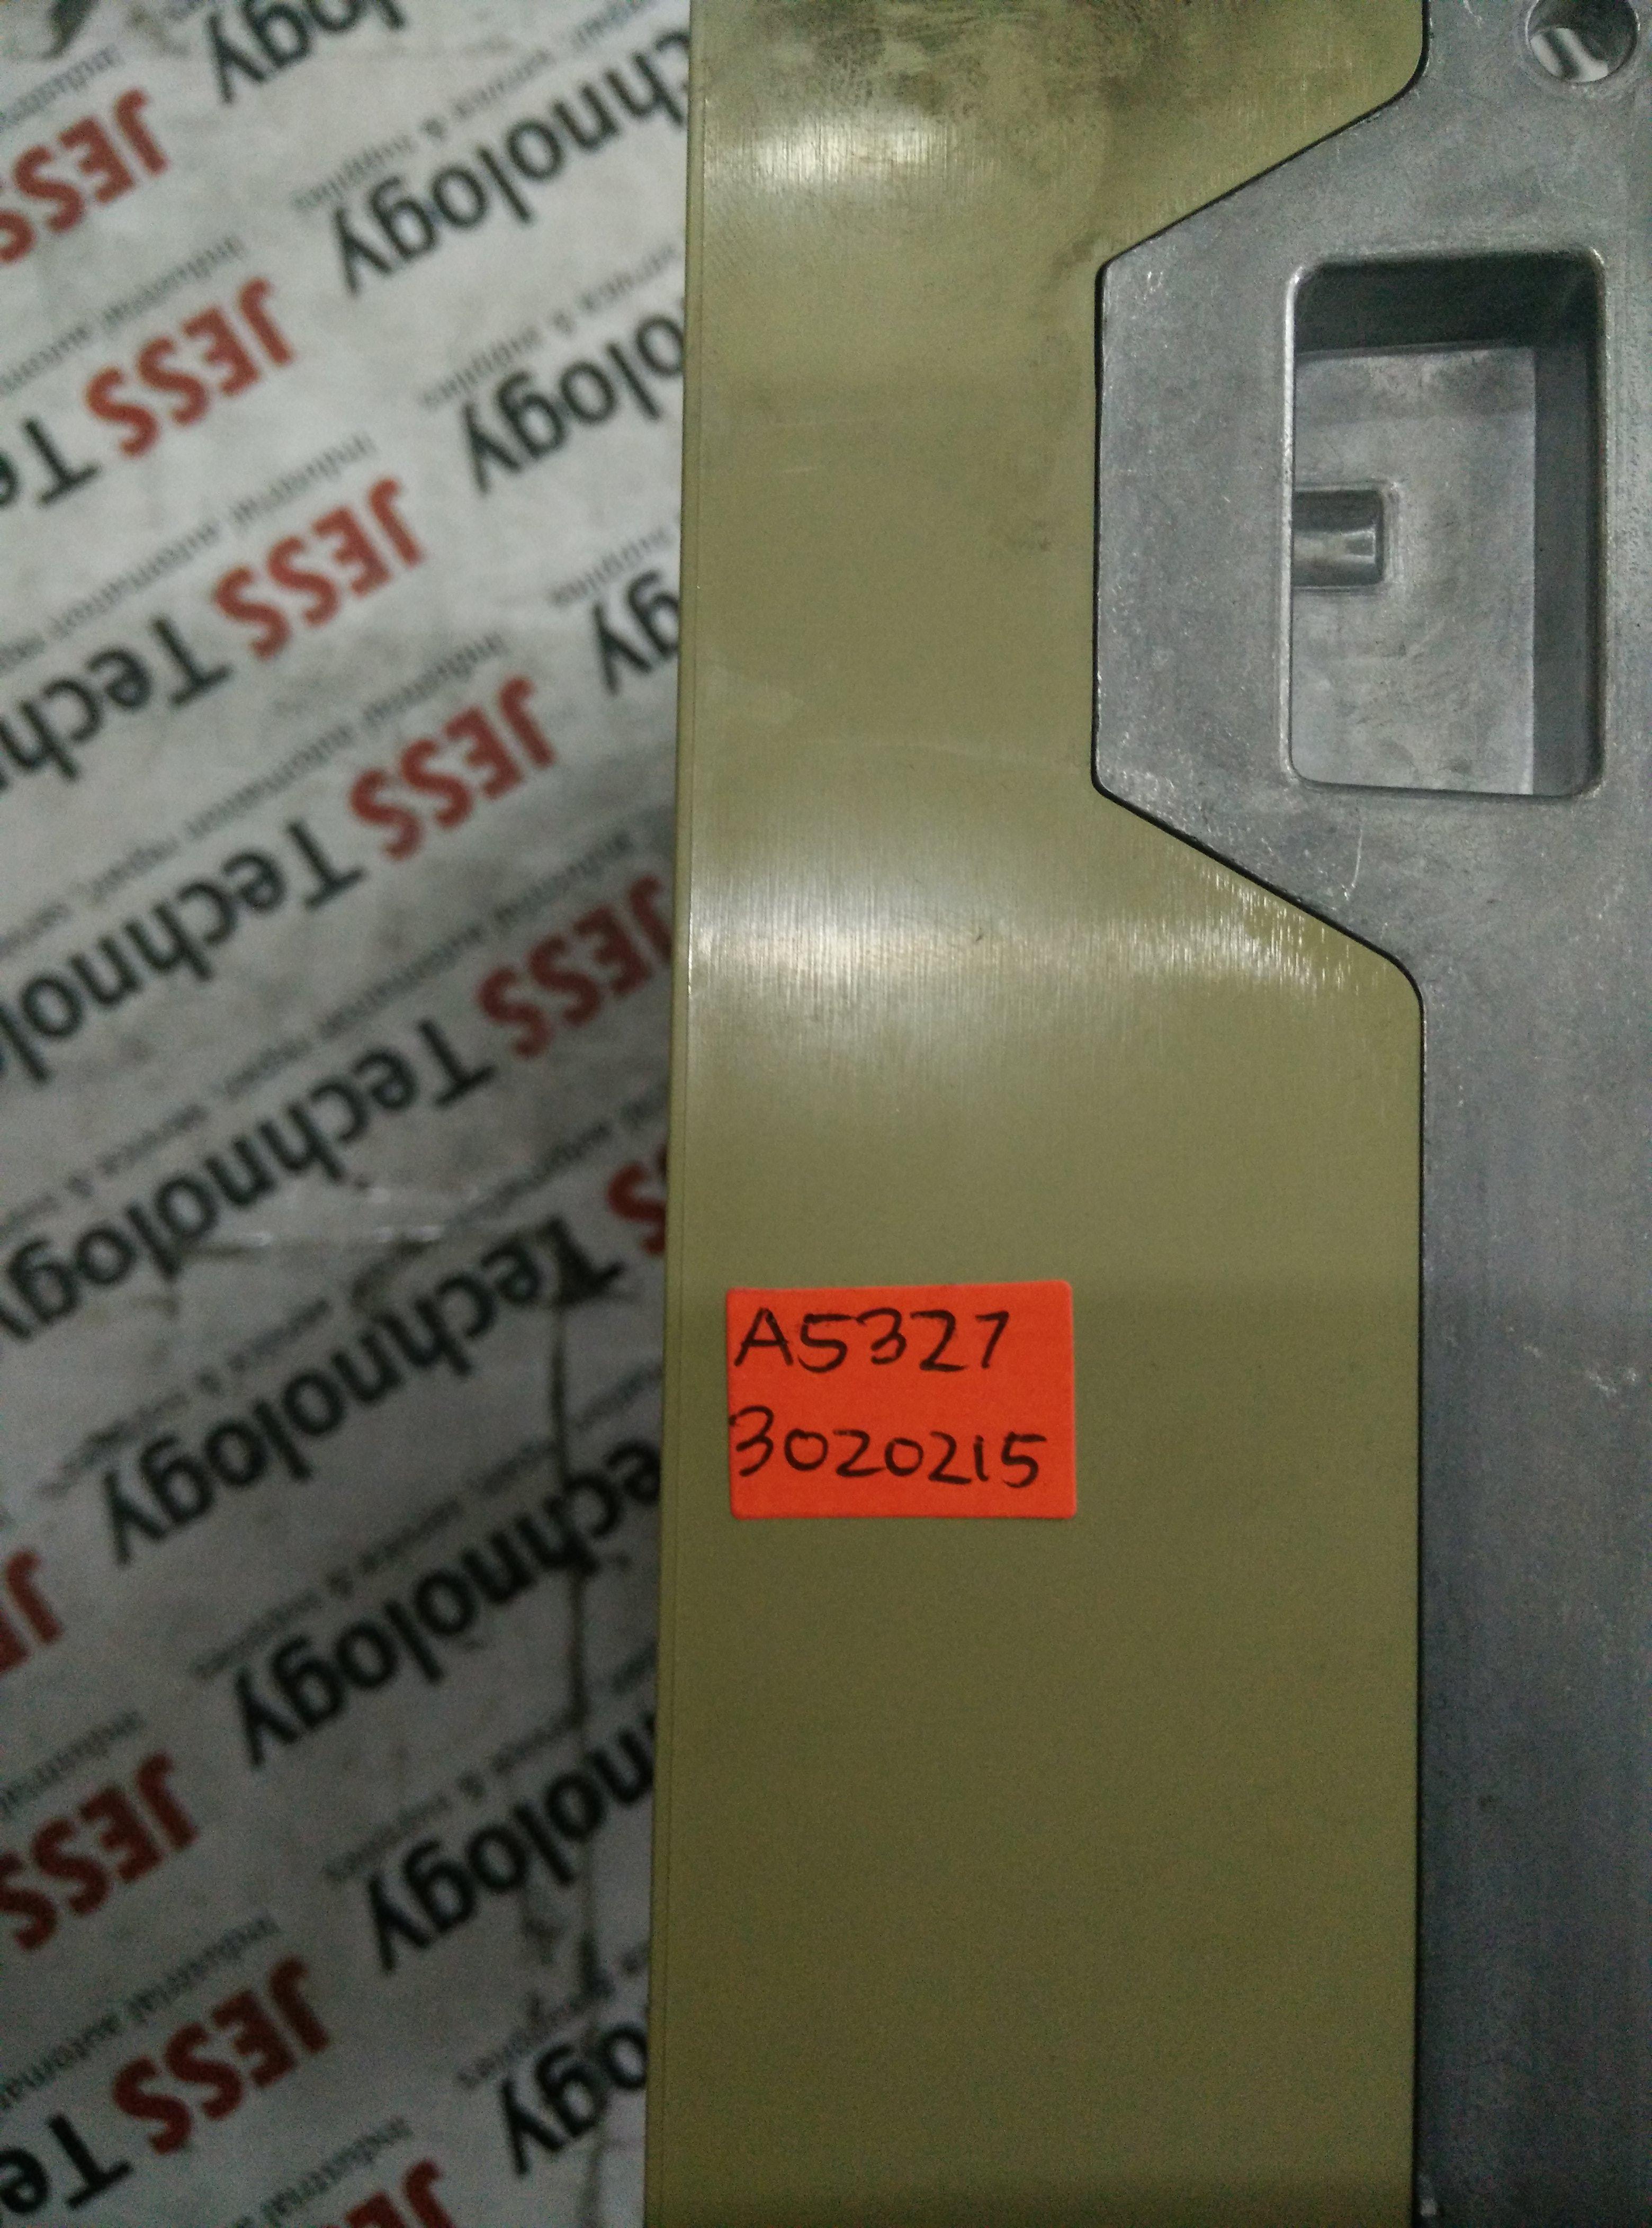 Repair SGDM-04AC-SD2A YASKAWA YASKAWA SERVOPACK in Malaysia, Singapore, Thailand, Indonesia